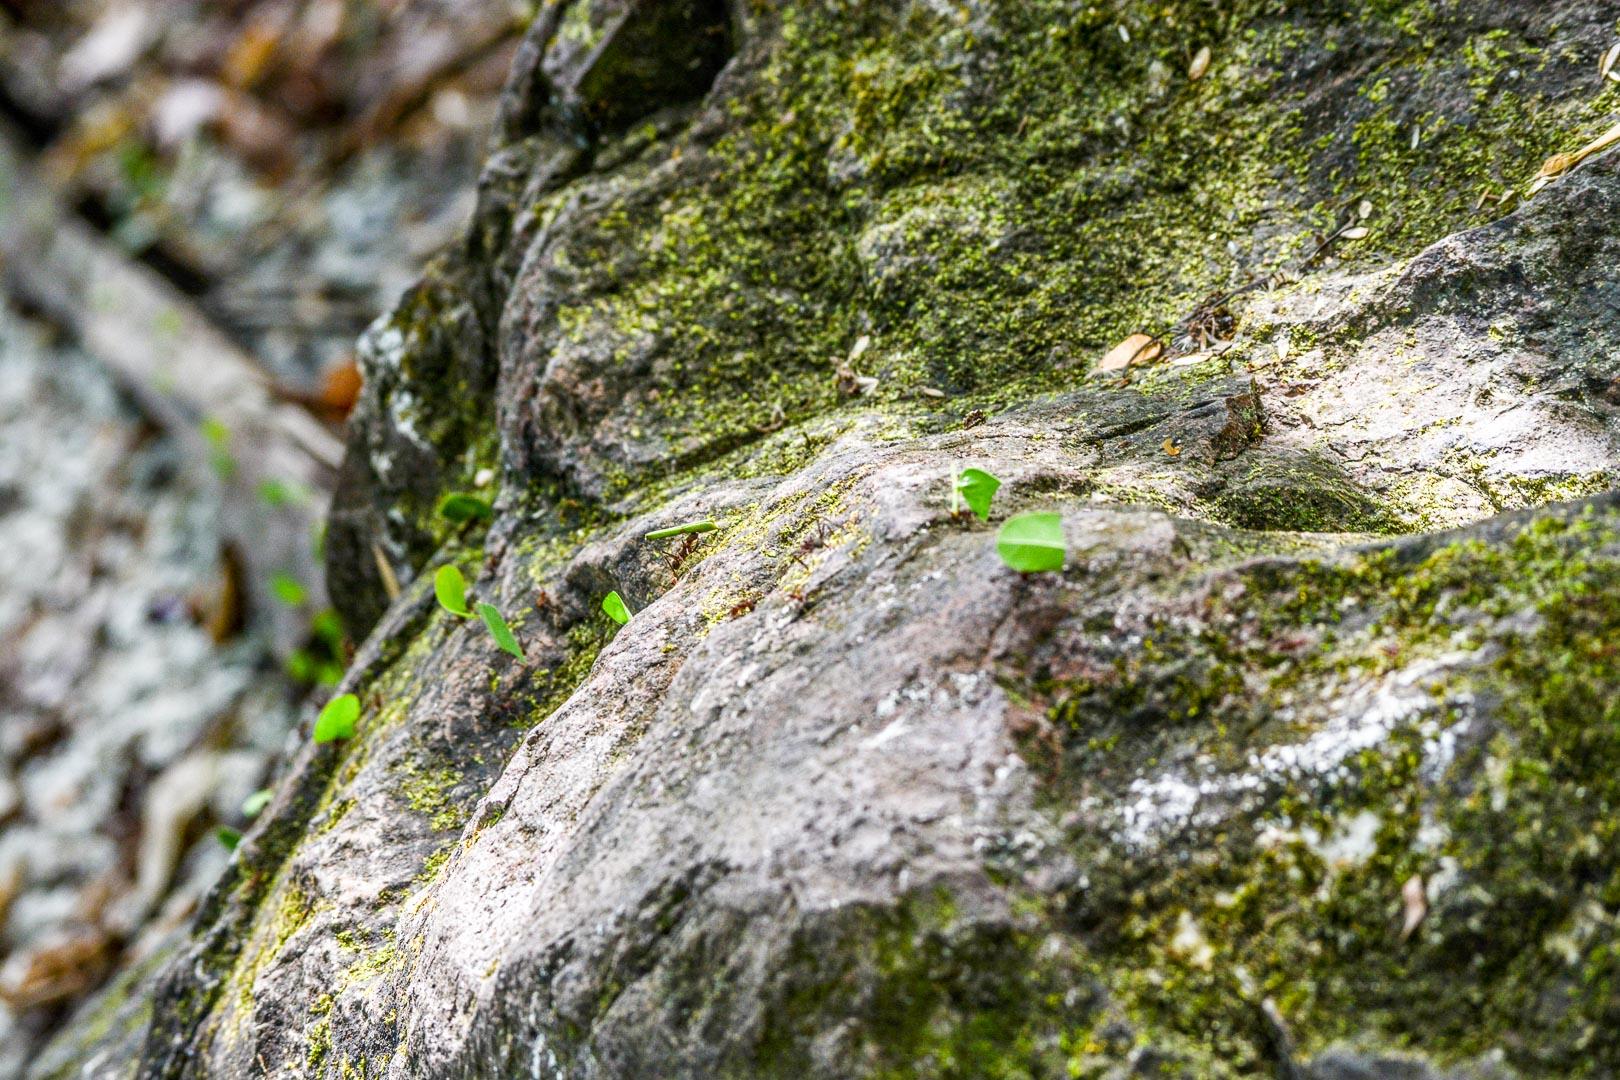 A line of leaf cutter ants traverse a rock